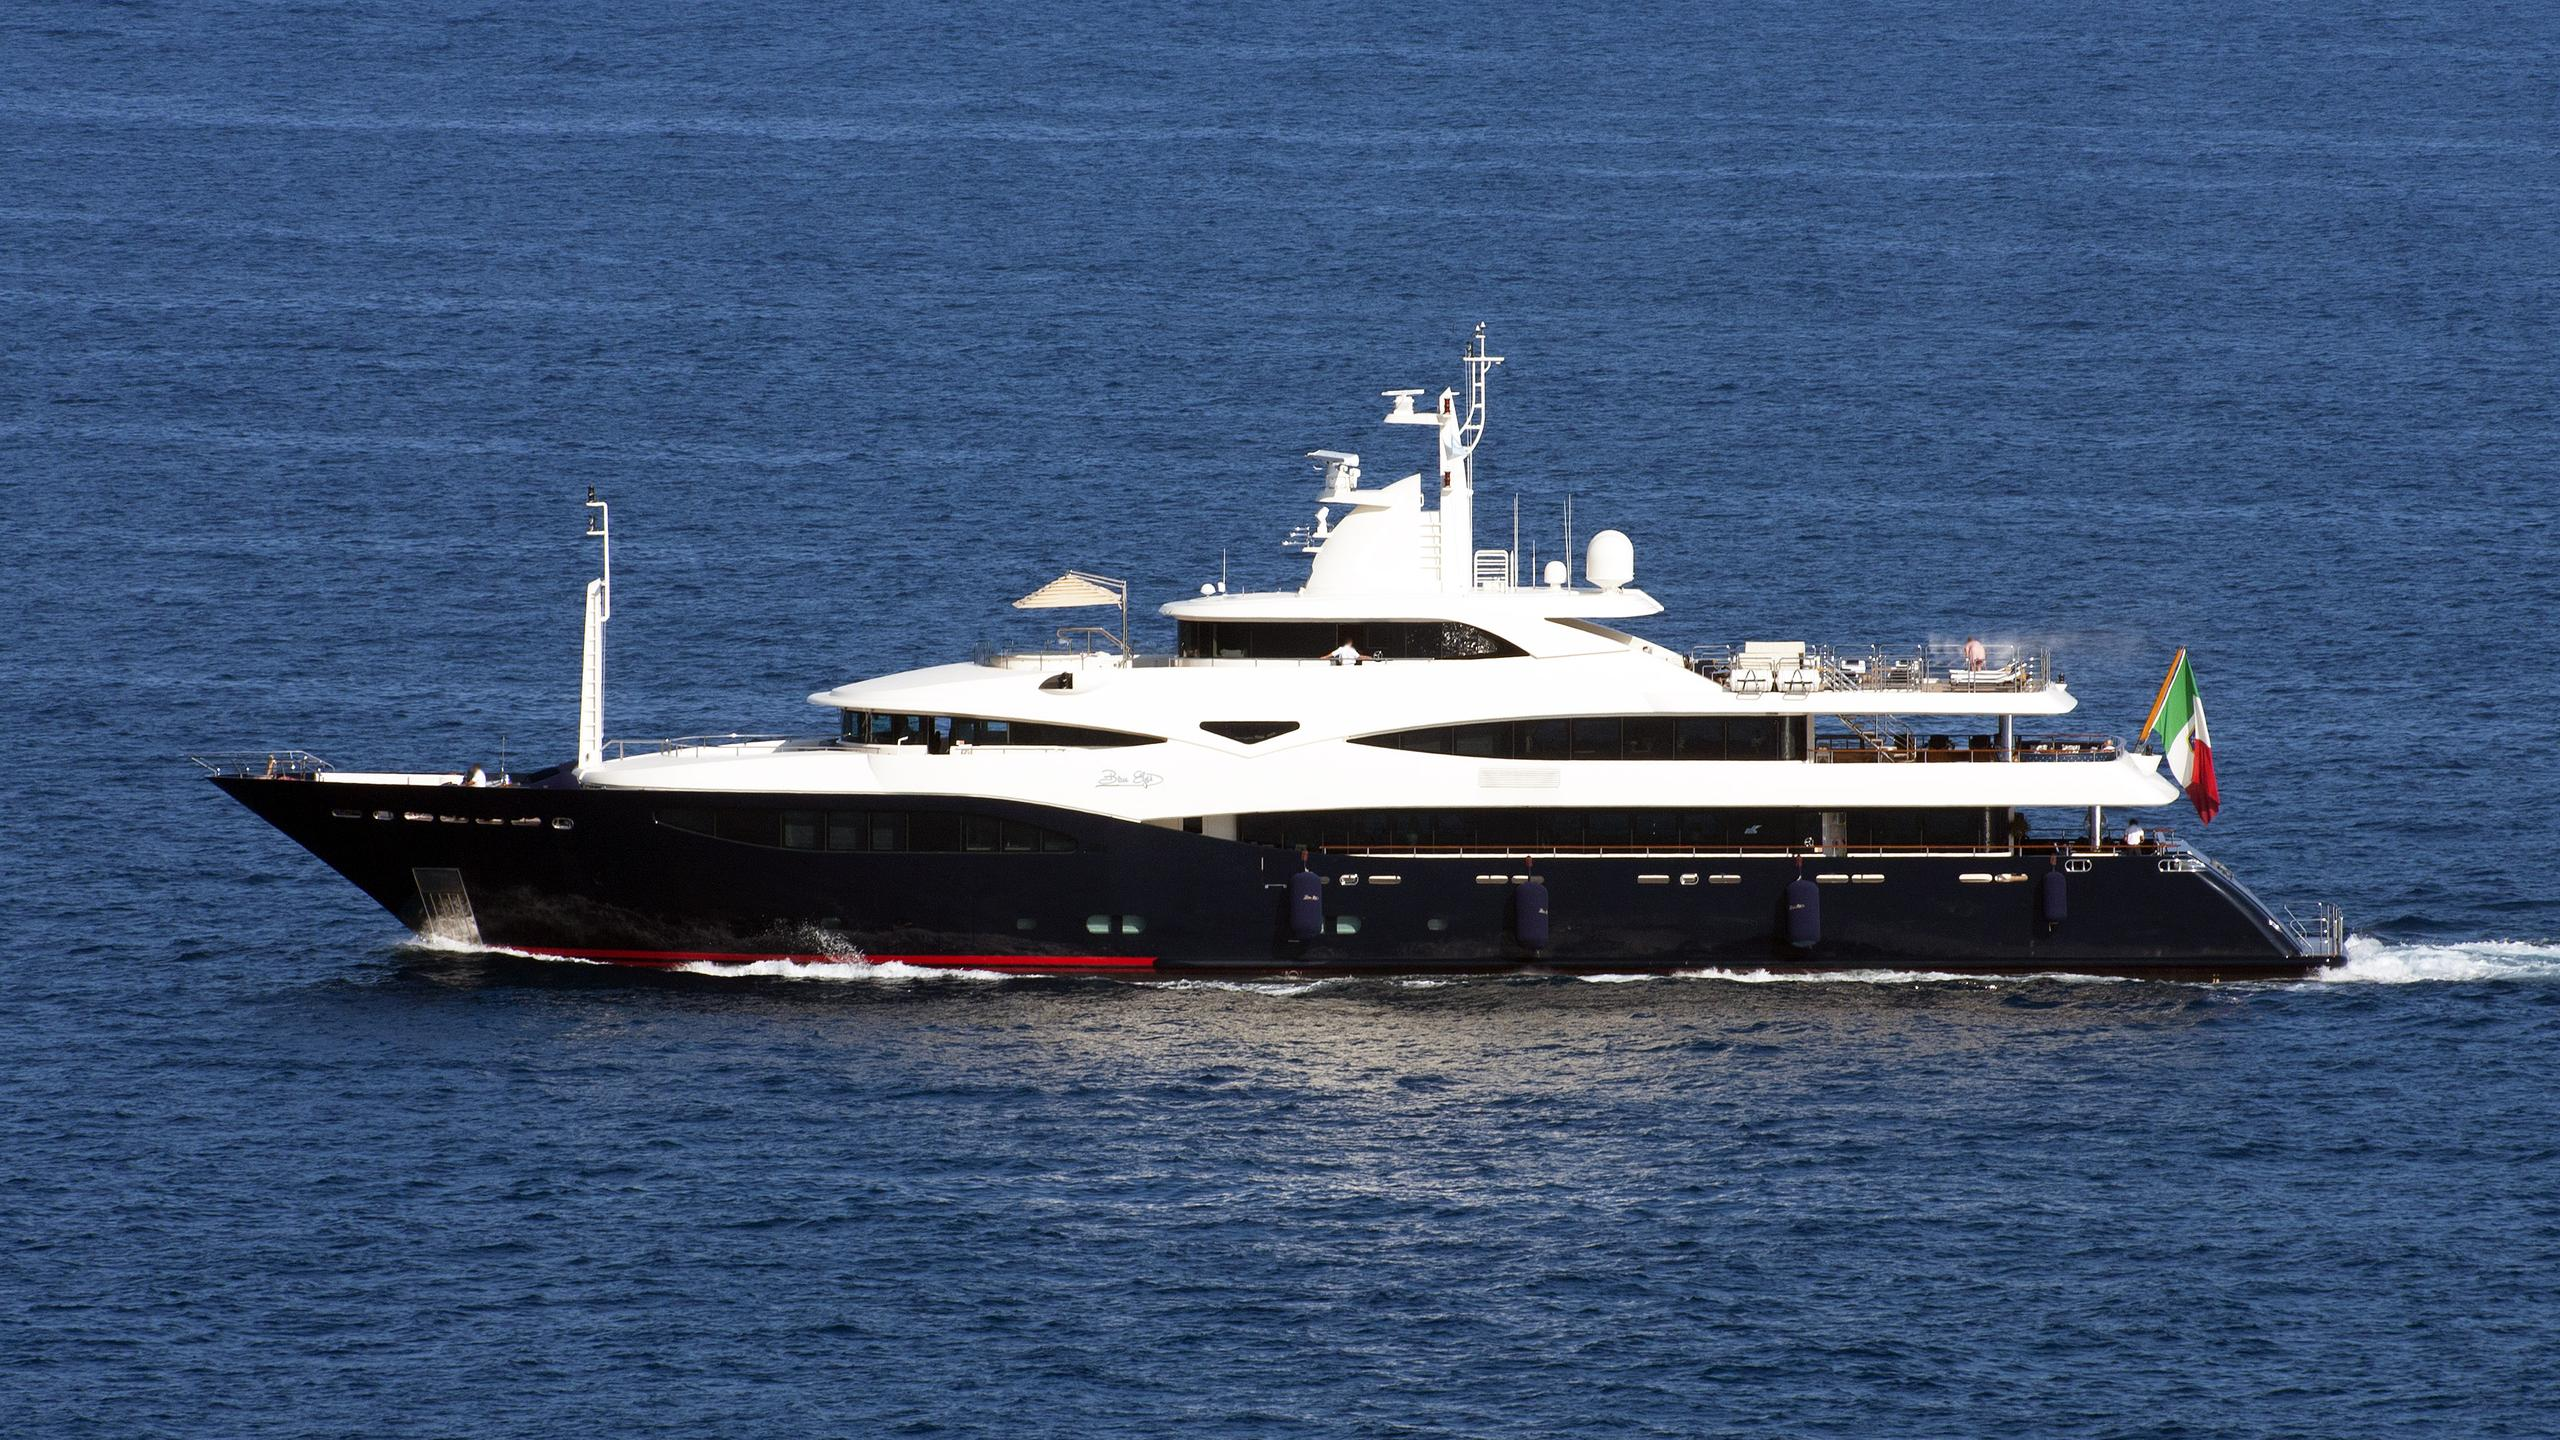 blue-eyes-motor-yacht-crn-2009-60m-cruising